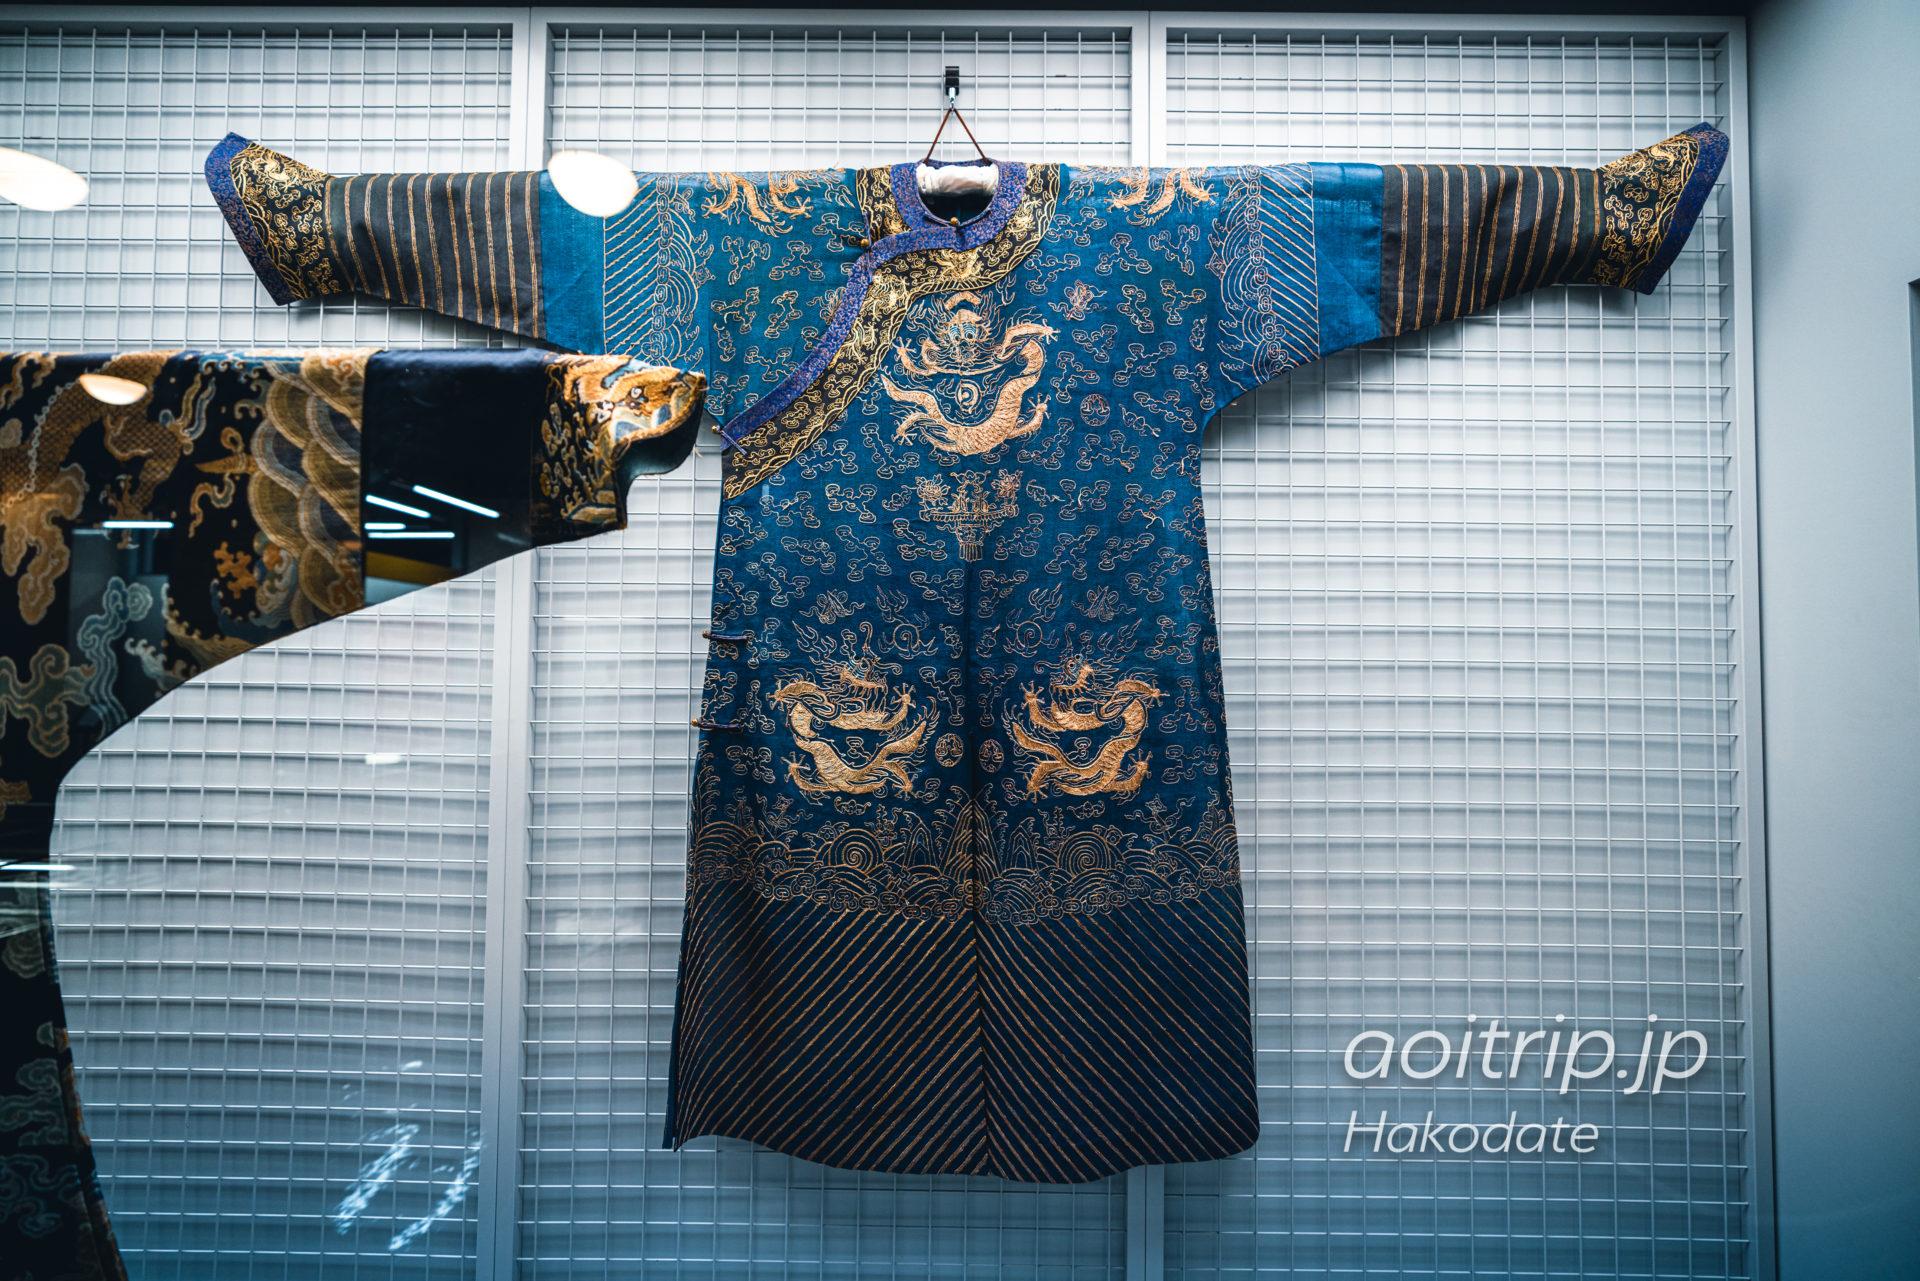 函館市北方民族資料館 Hakodate City Museum of Northern Peoples